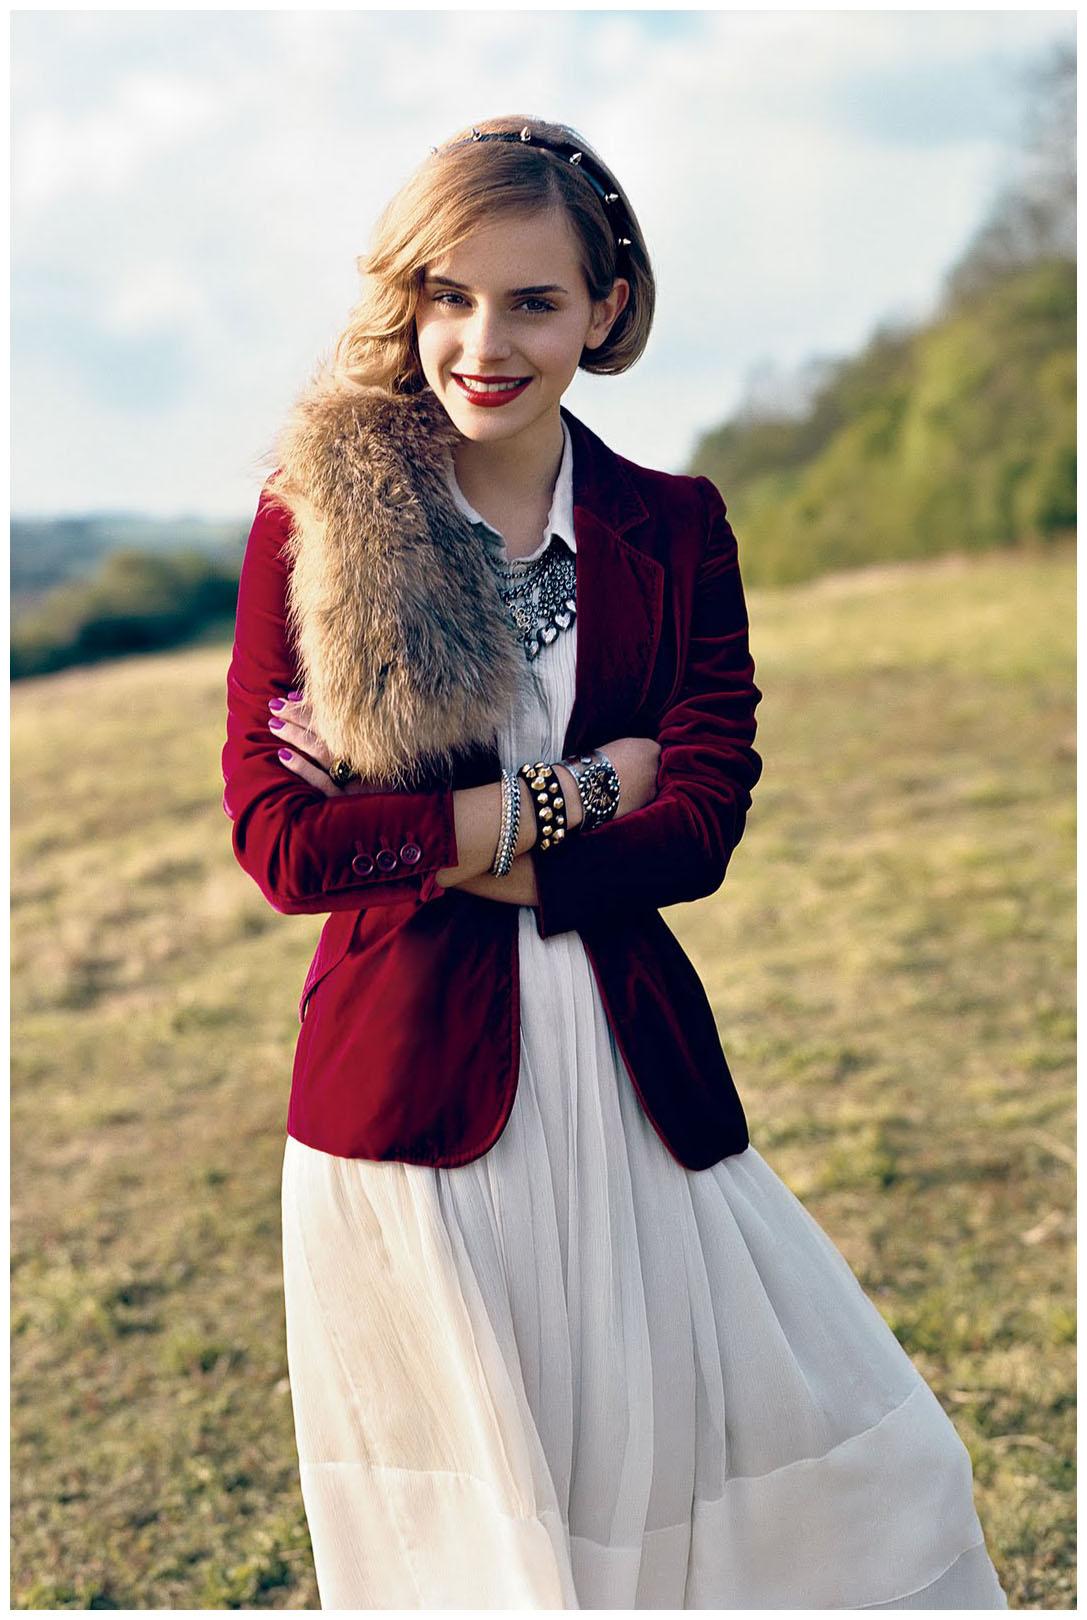 Emma Watson Hollywood Actress 40 Fantastic Photos: © Pleasurephoto